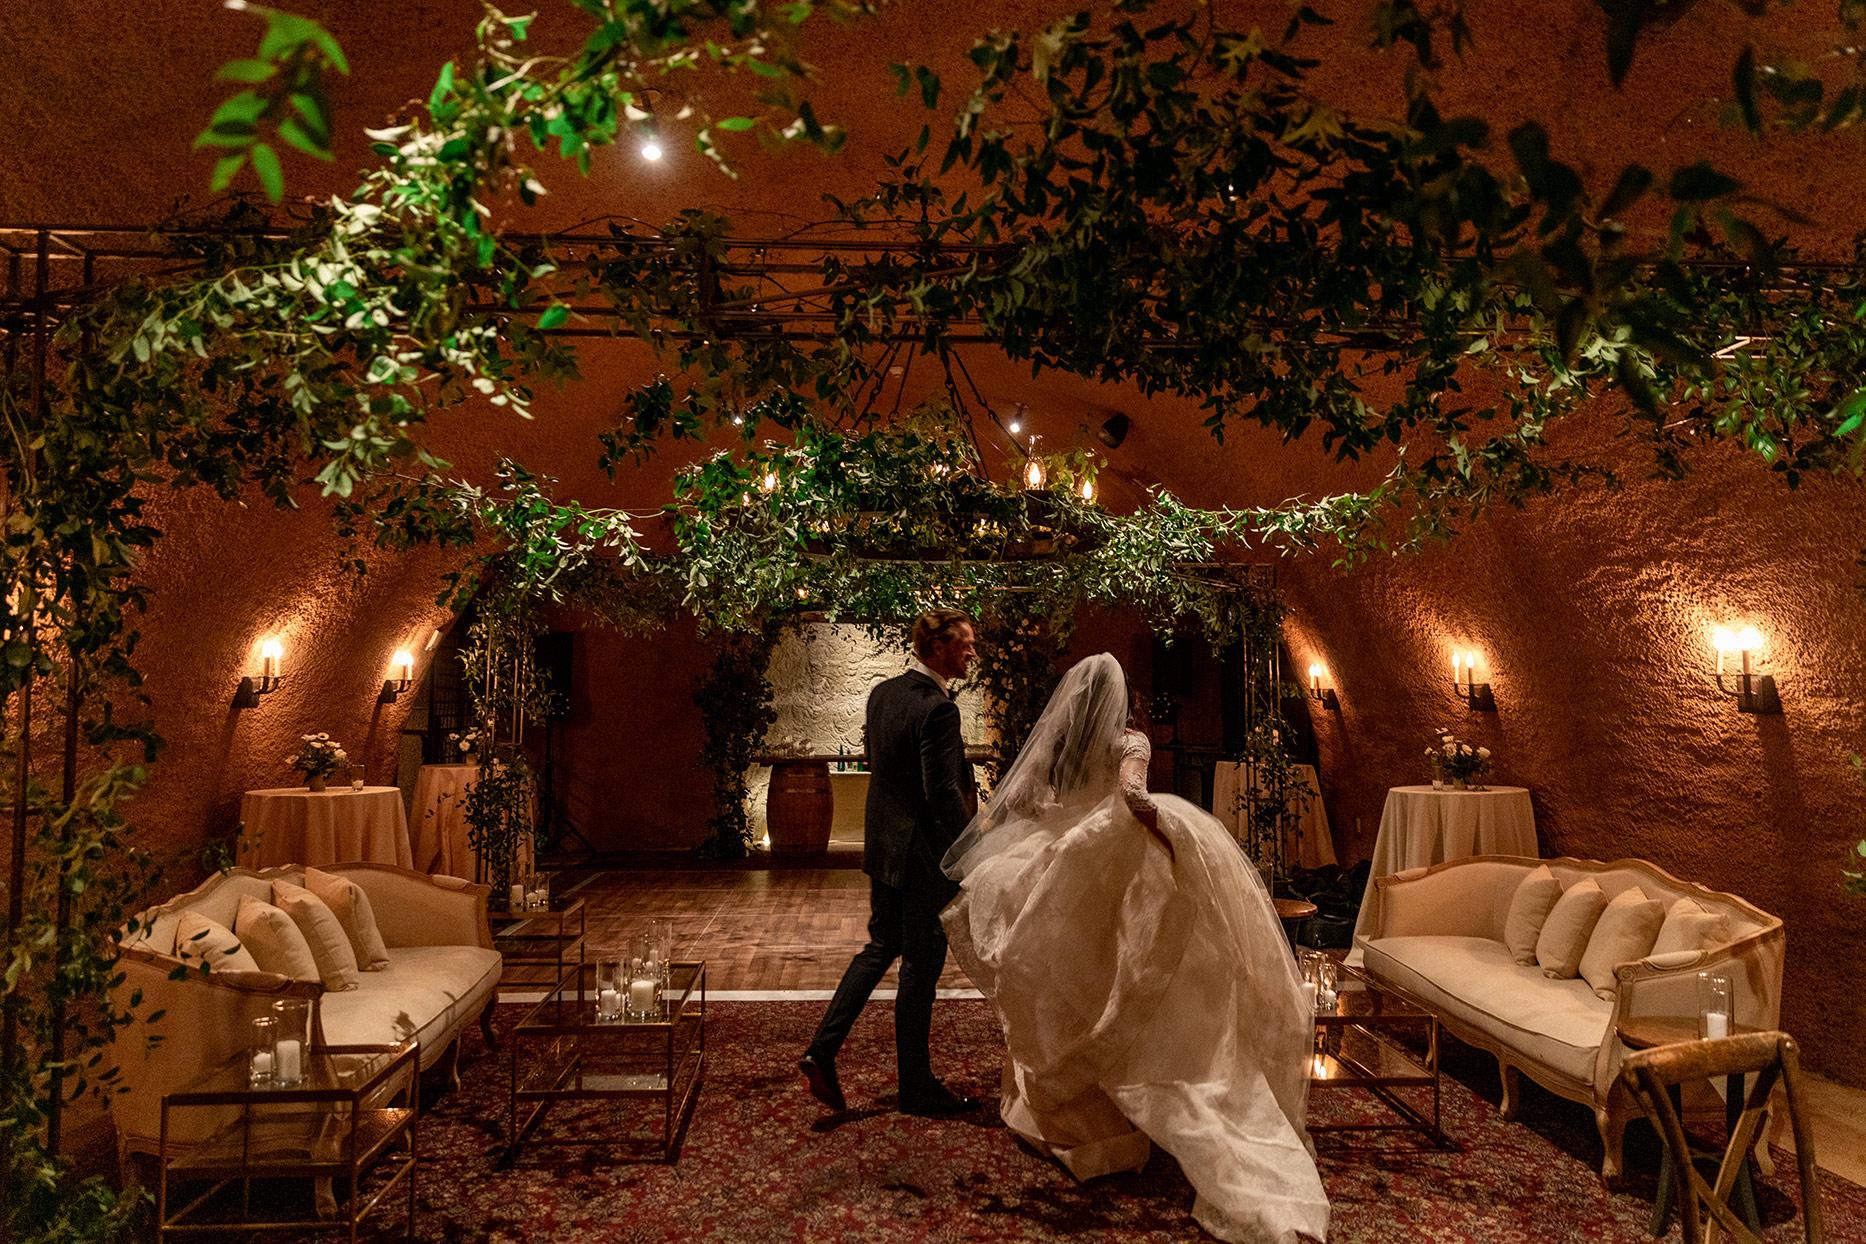 bride and groom walking through wedding cave